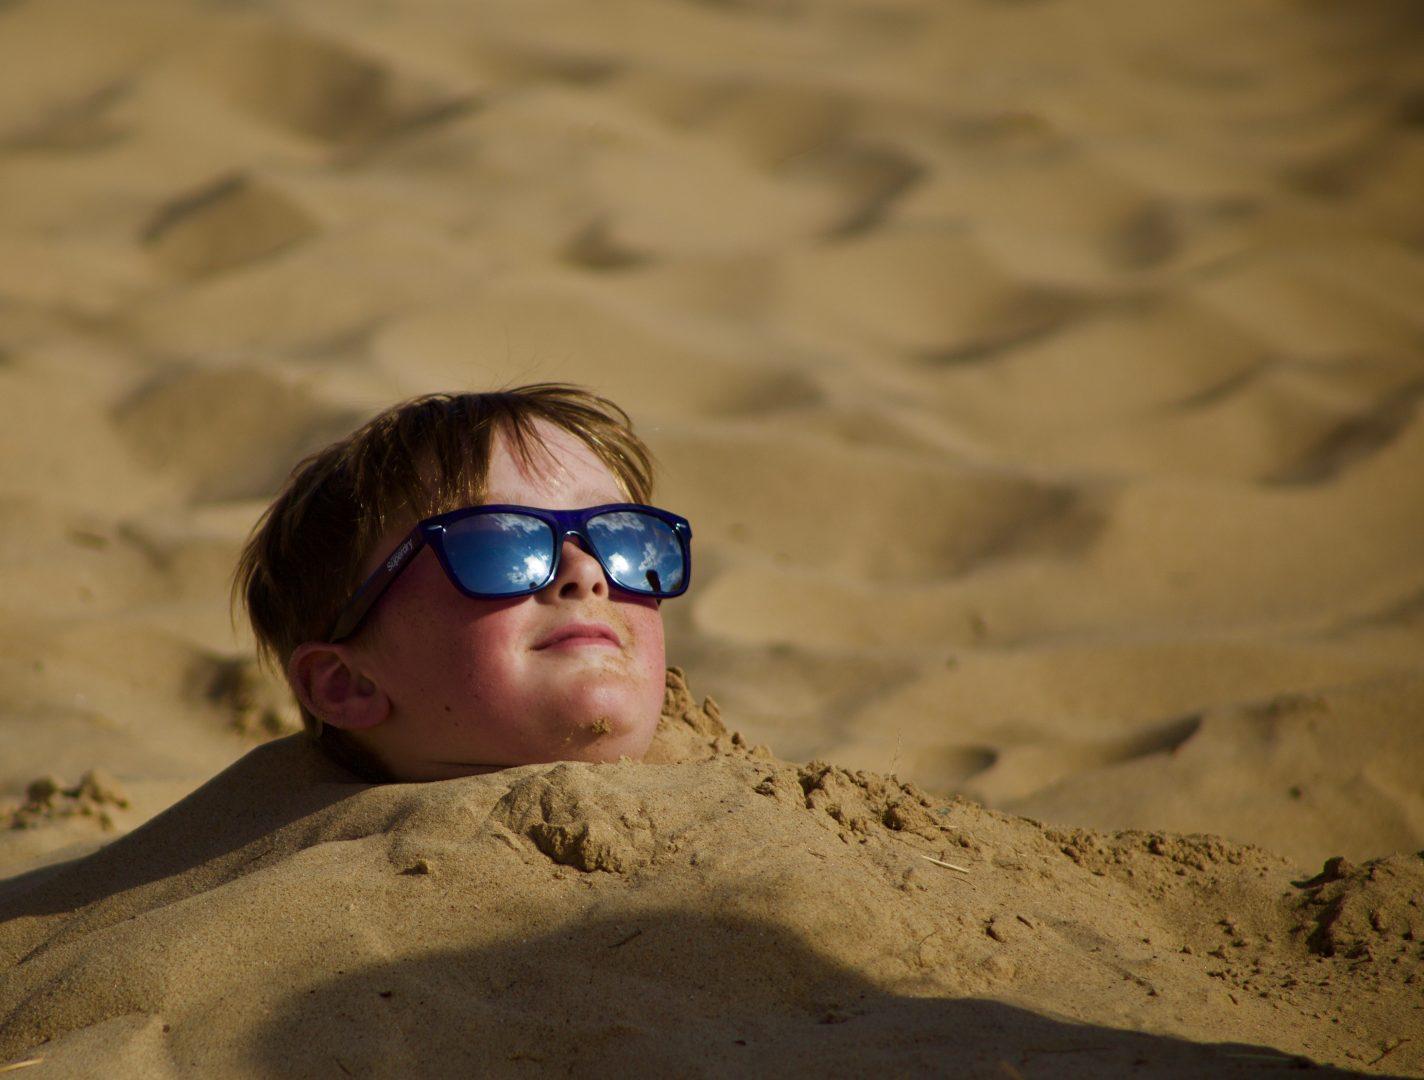 richard-pennystan-unsplash-boy-sand-